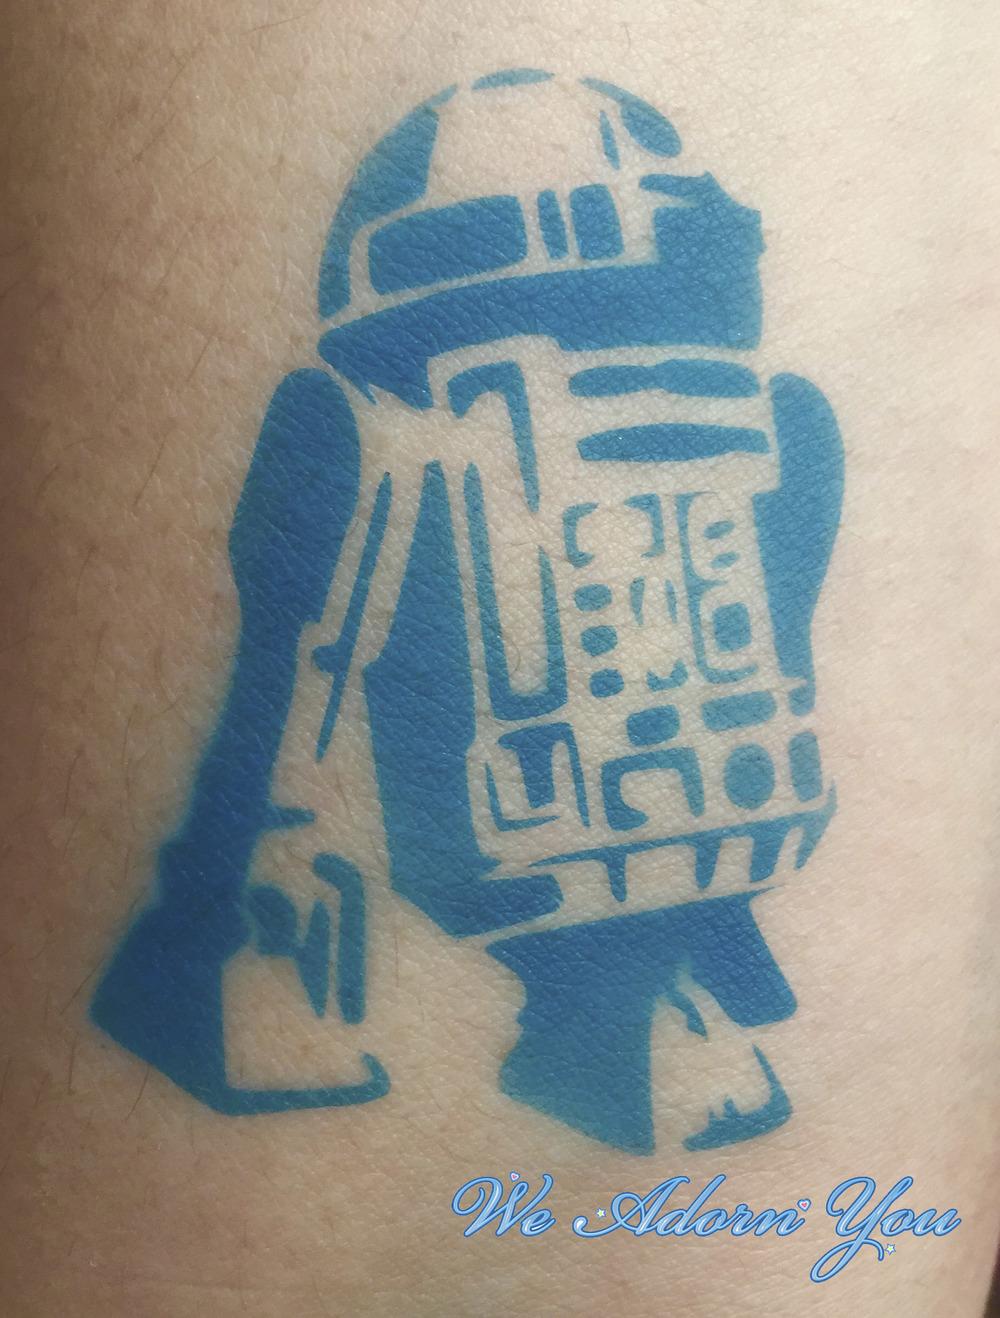 Airbrush Tattoo R2D2 - We Adorn You.jpg